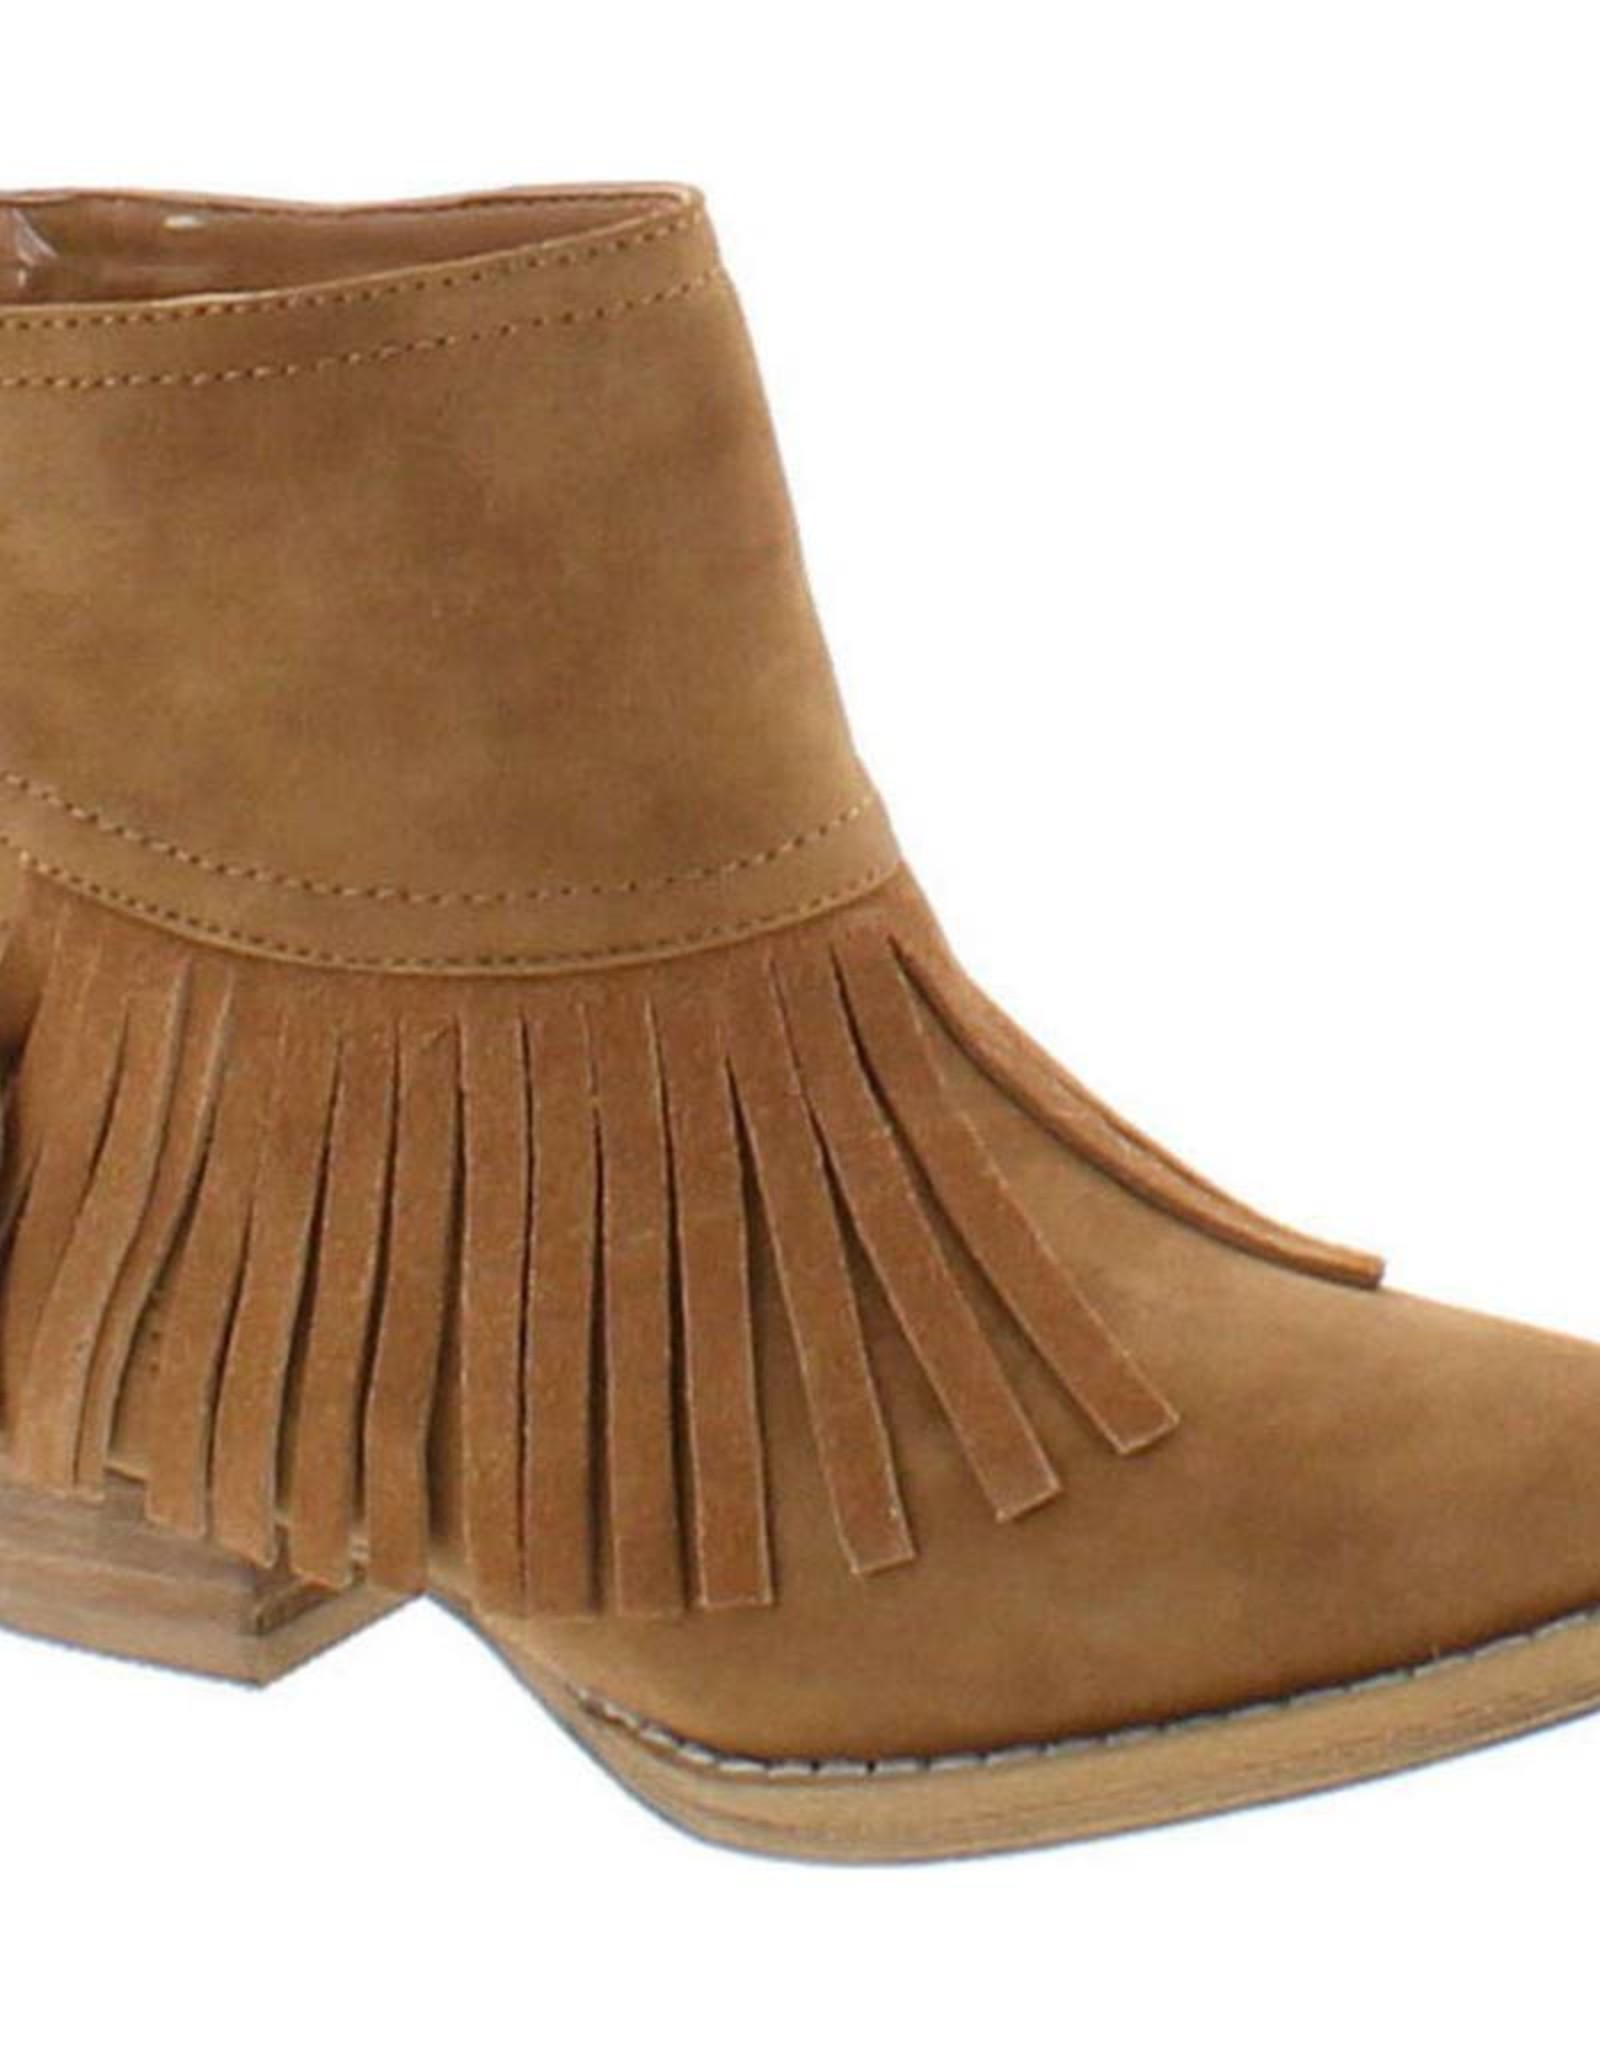 Volatile Barkley Boots in Tan